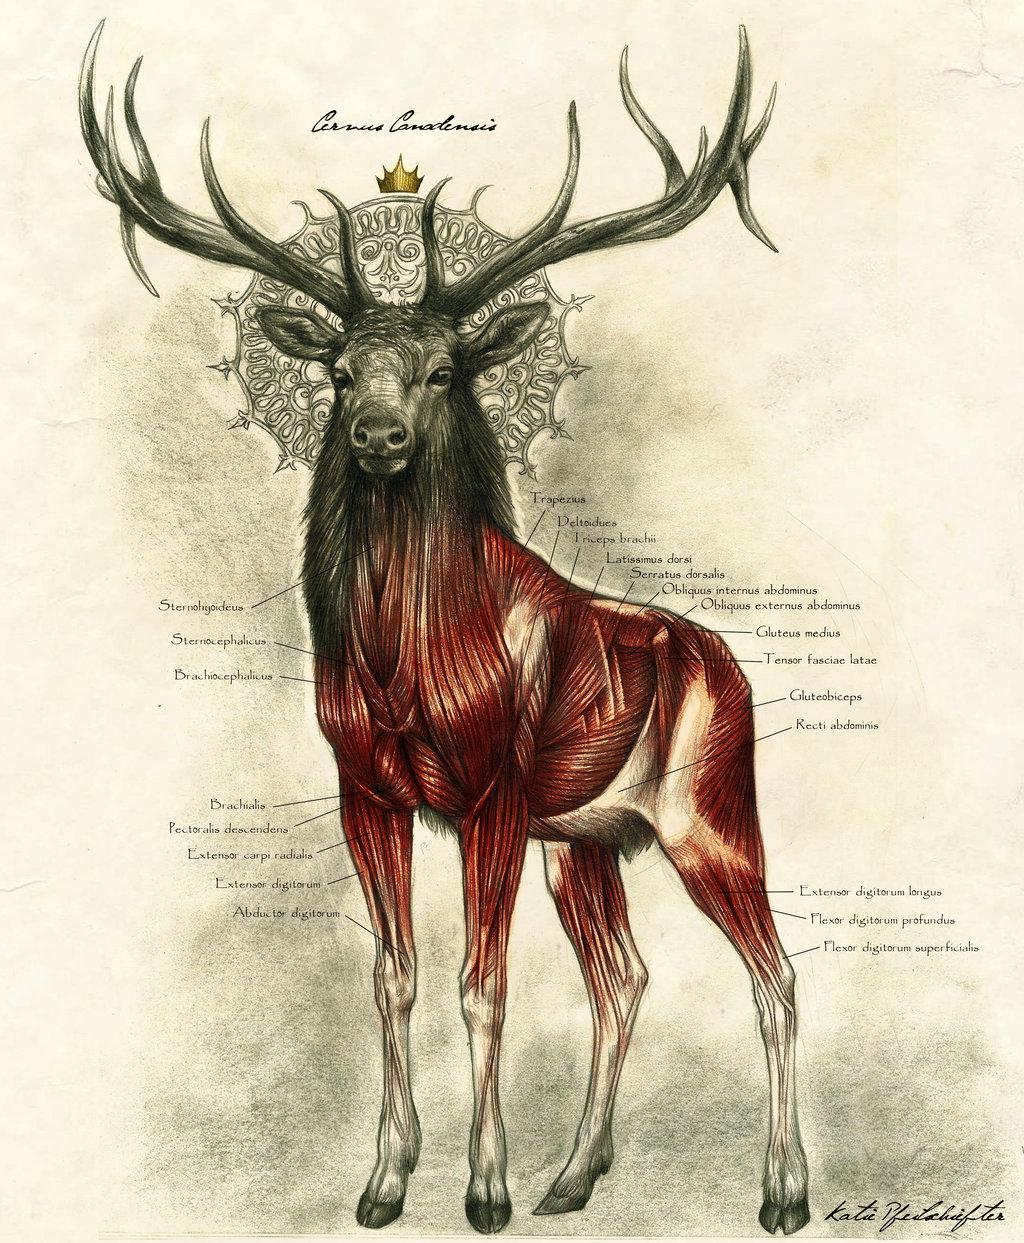 Drawn reindeer majestic Anatomy Musculature Anatomy: Illustrations a